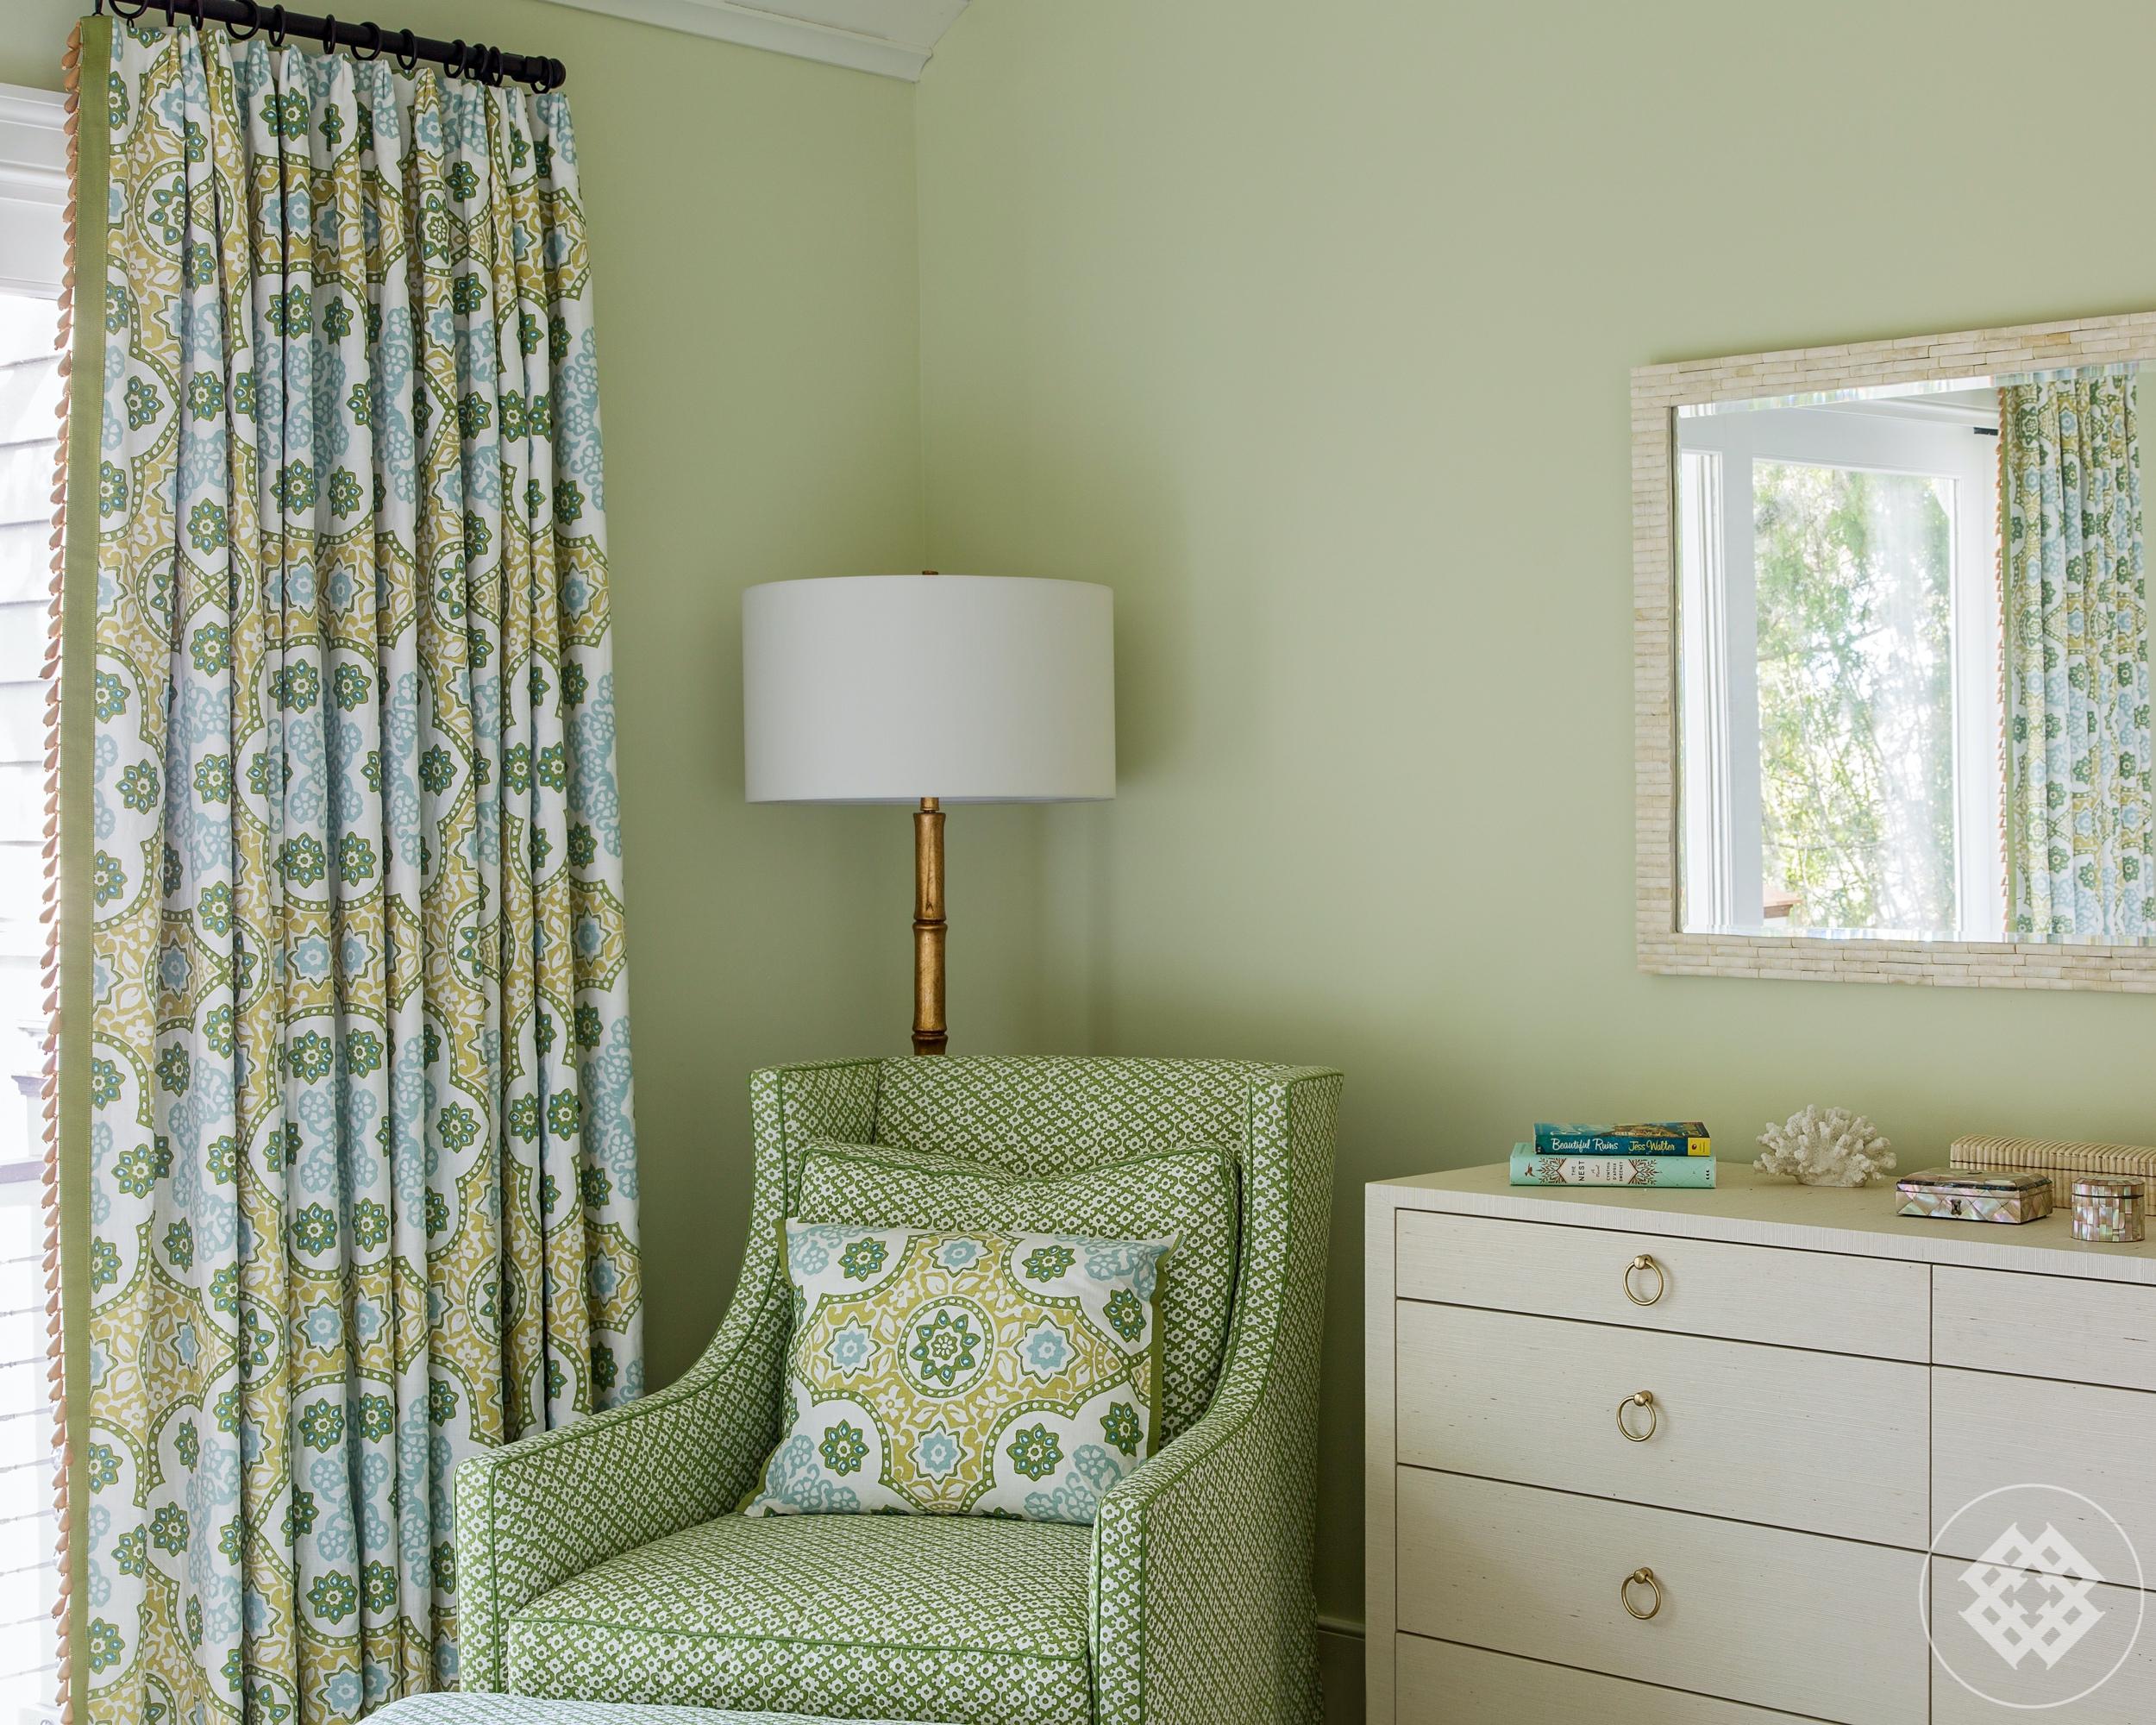 hss-master-bedroom-sitting-area.jpg